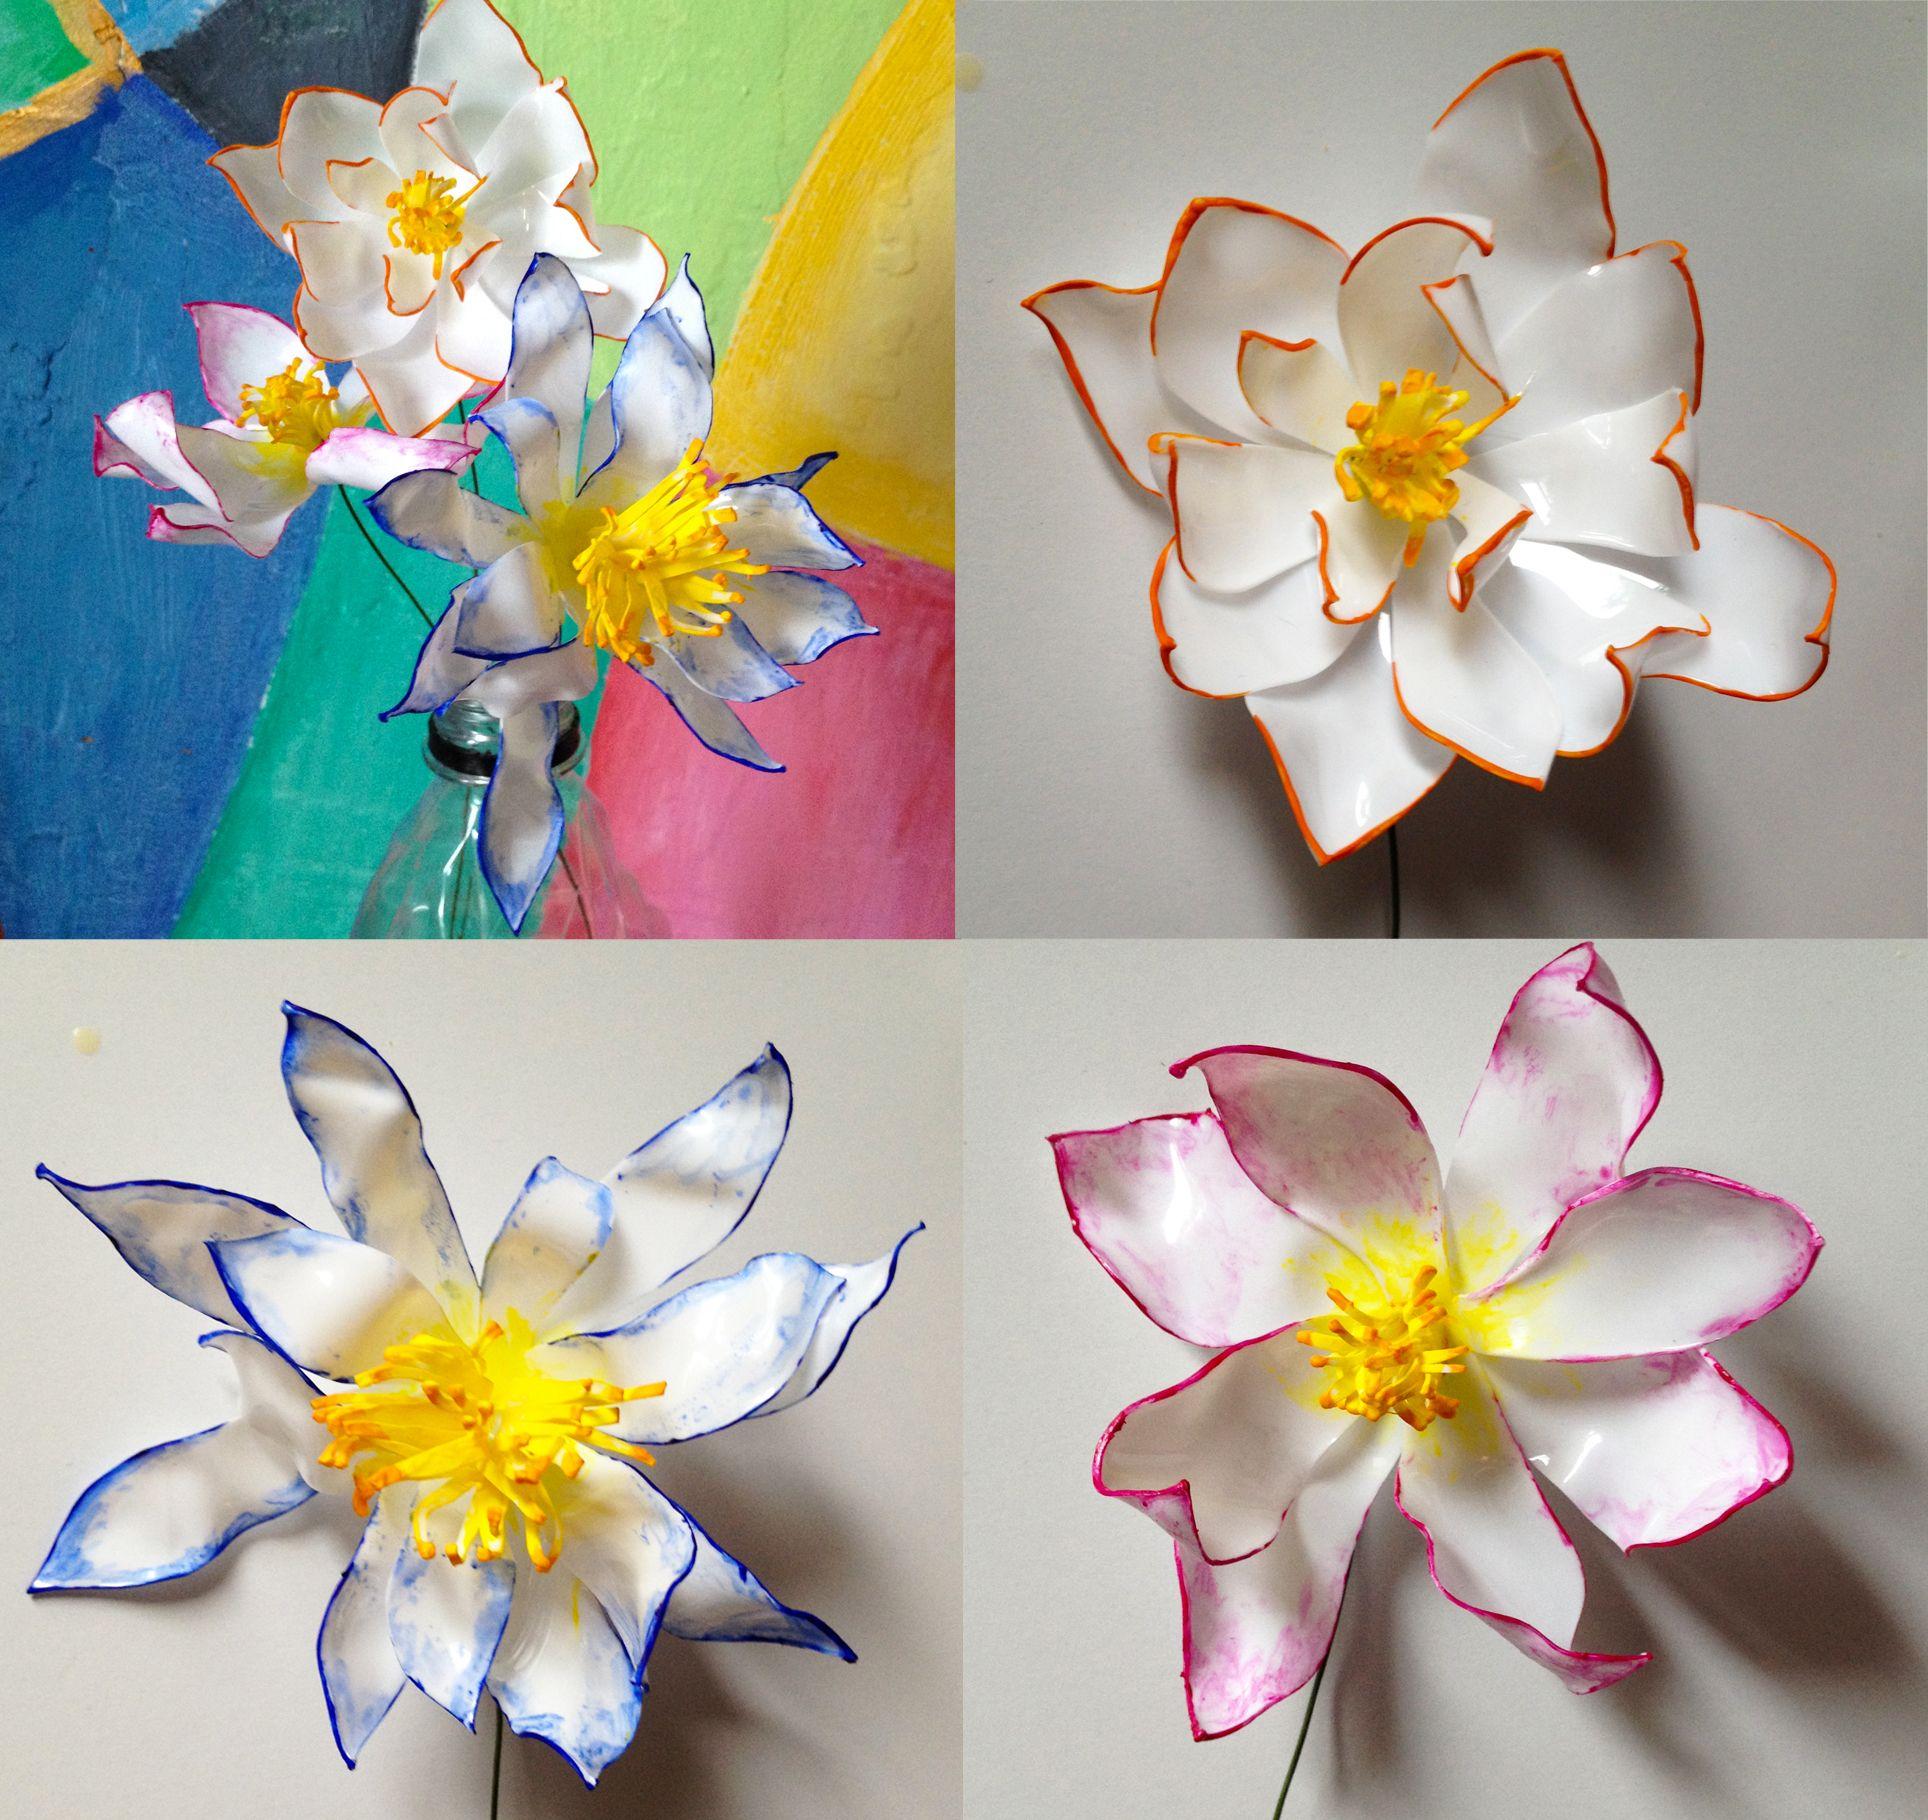 Plastic Bottle Flowers + Acrylic Painting